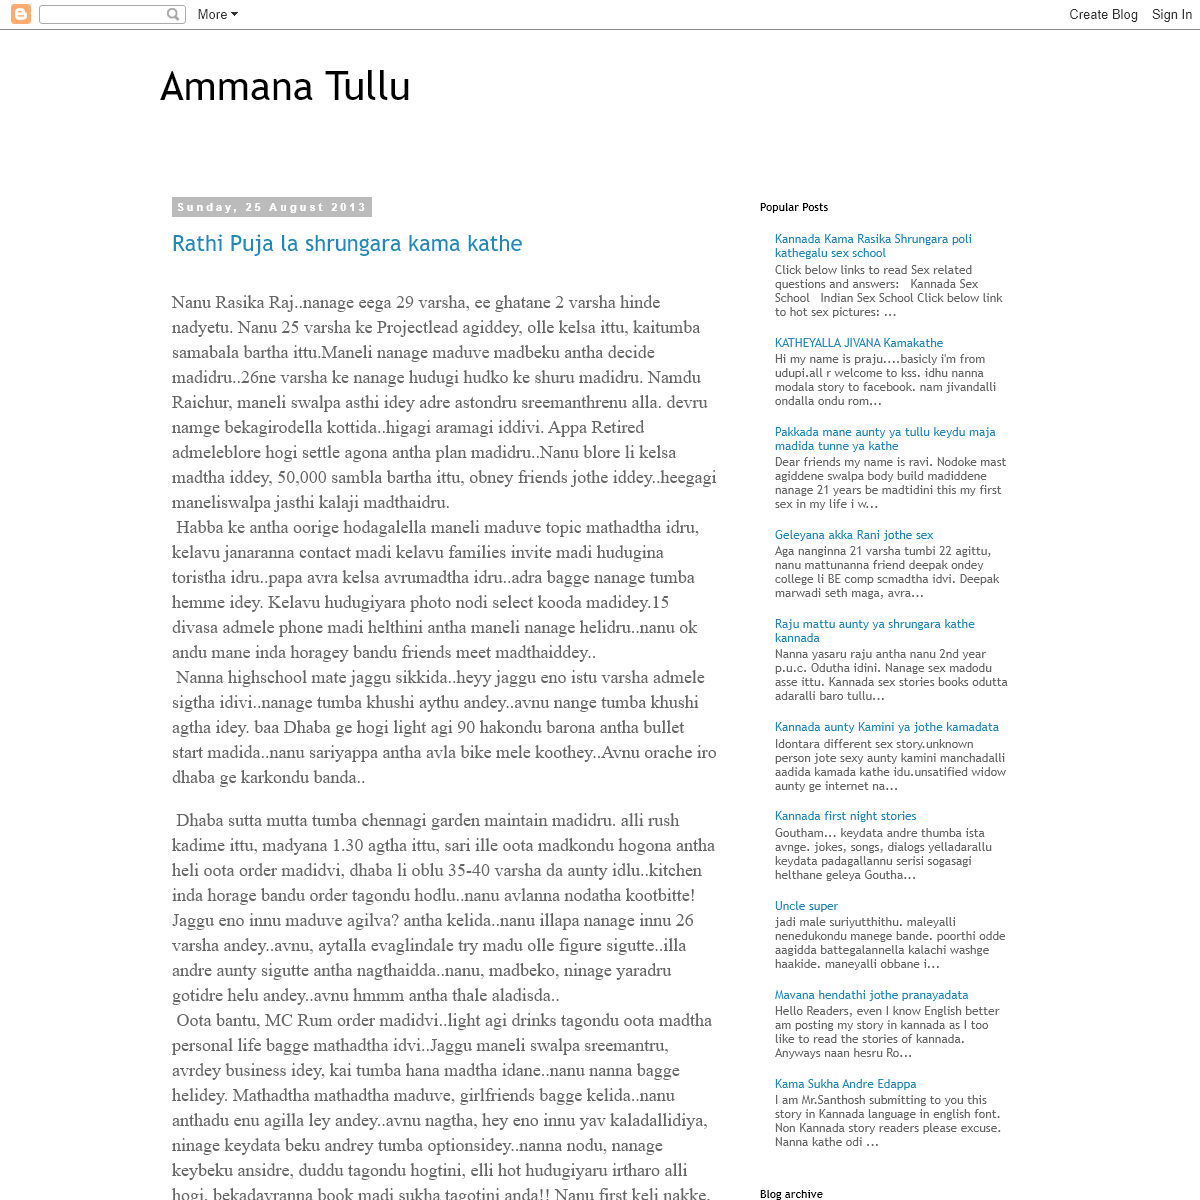 Ammana Tullu- August 2013